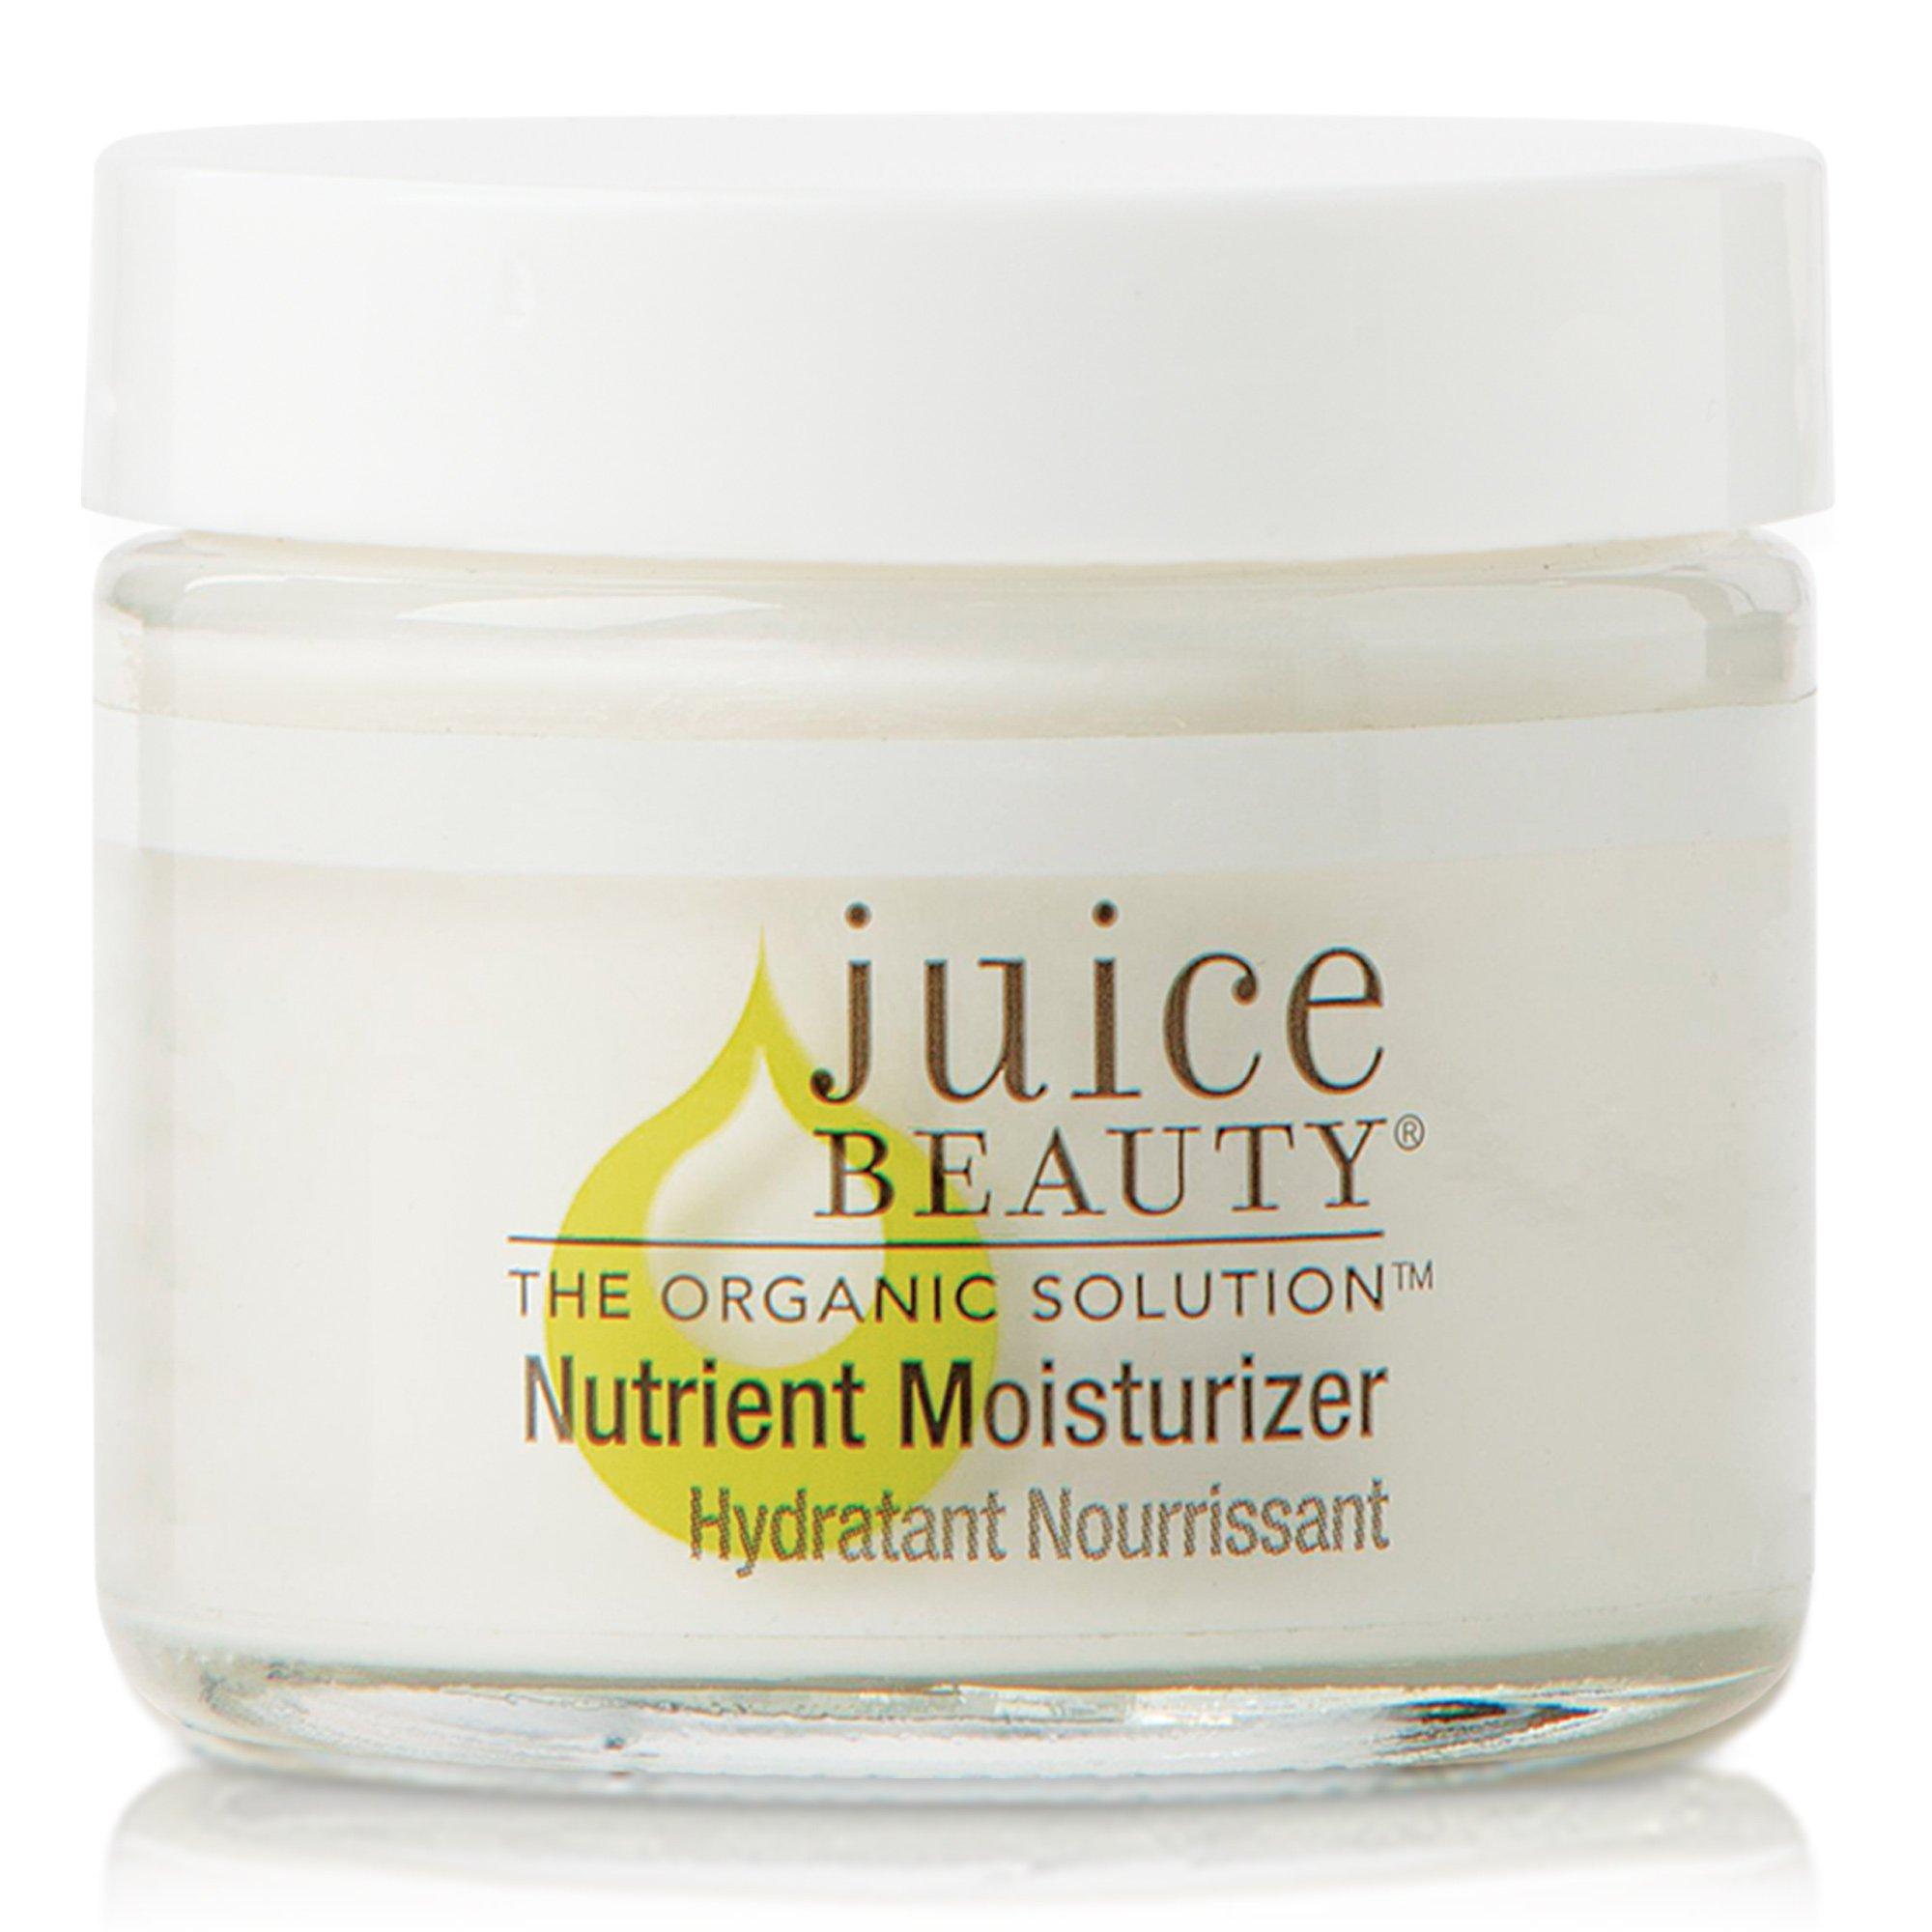 Juice Beauty Nutrient Moisturizer, 2 fl. oz.